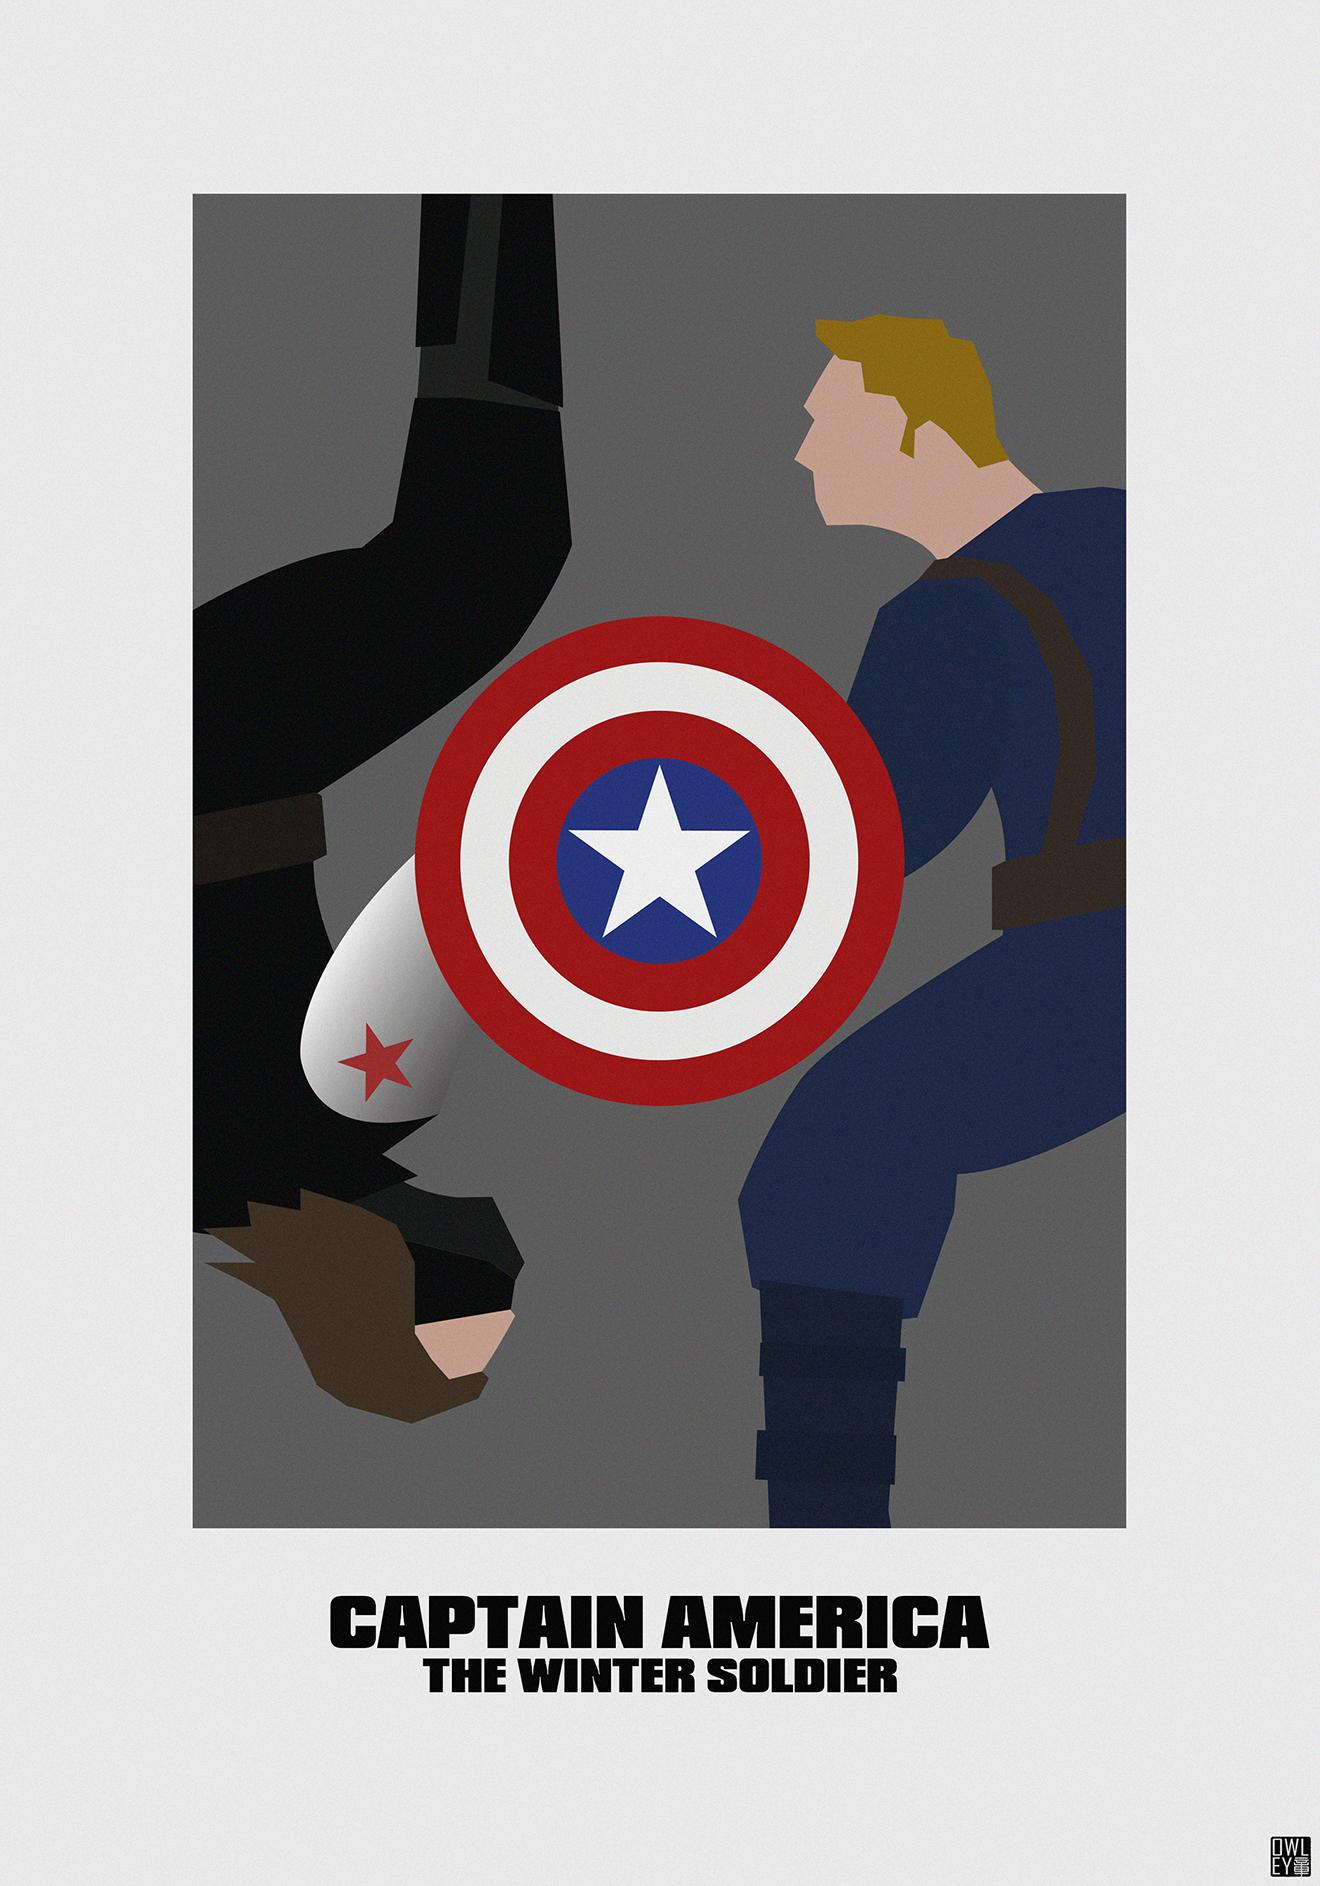 CaptainAmericaSmall